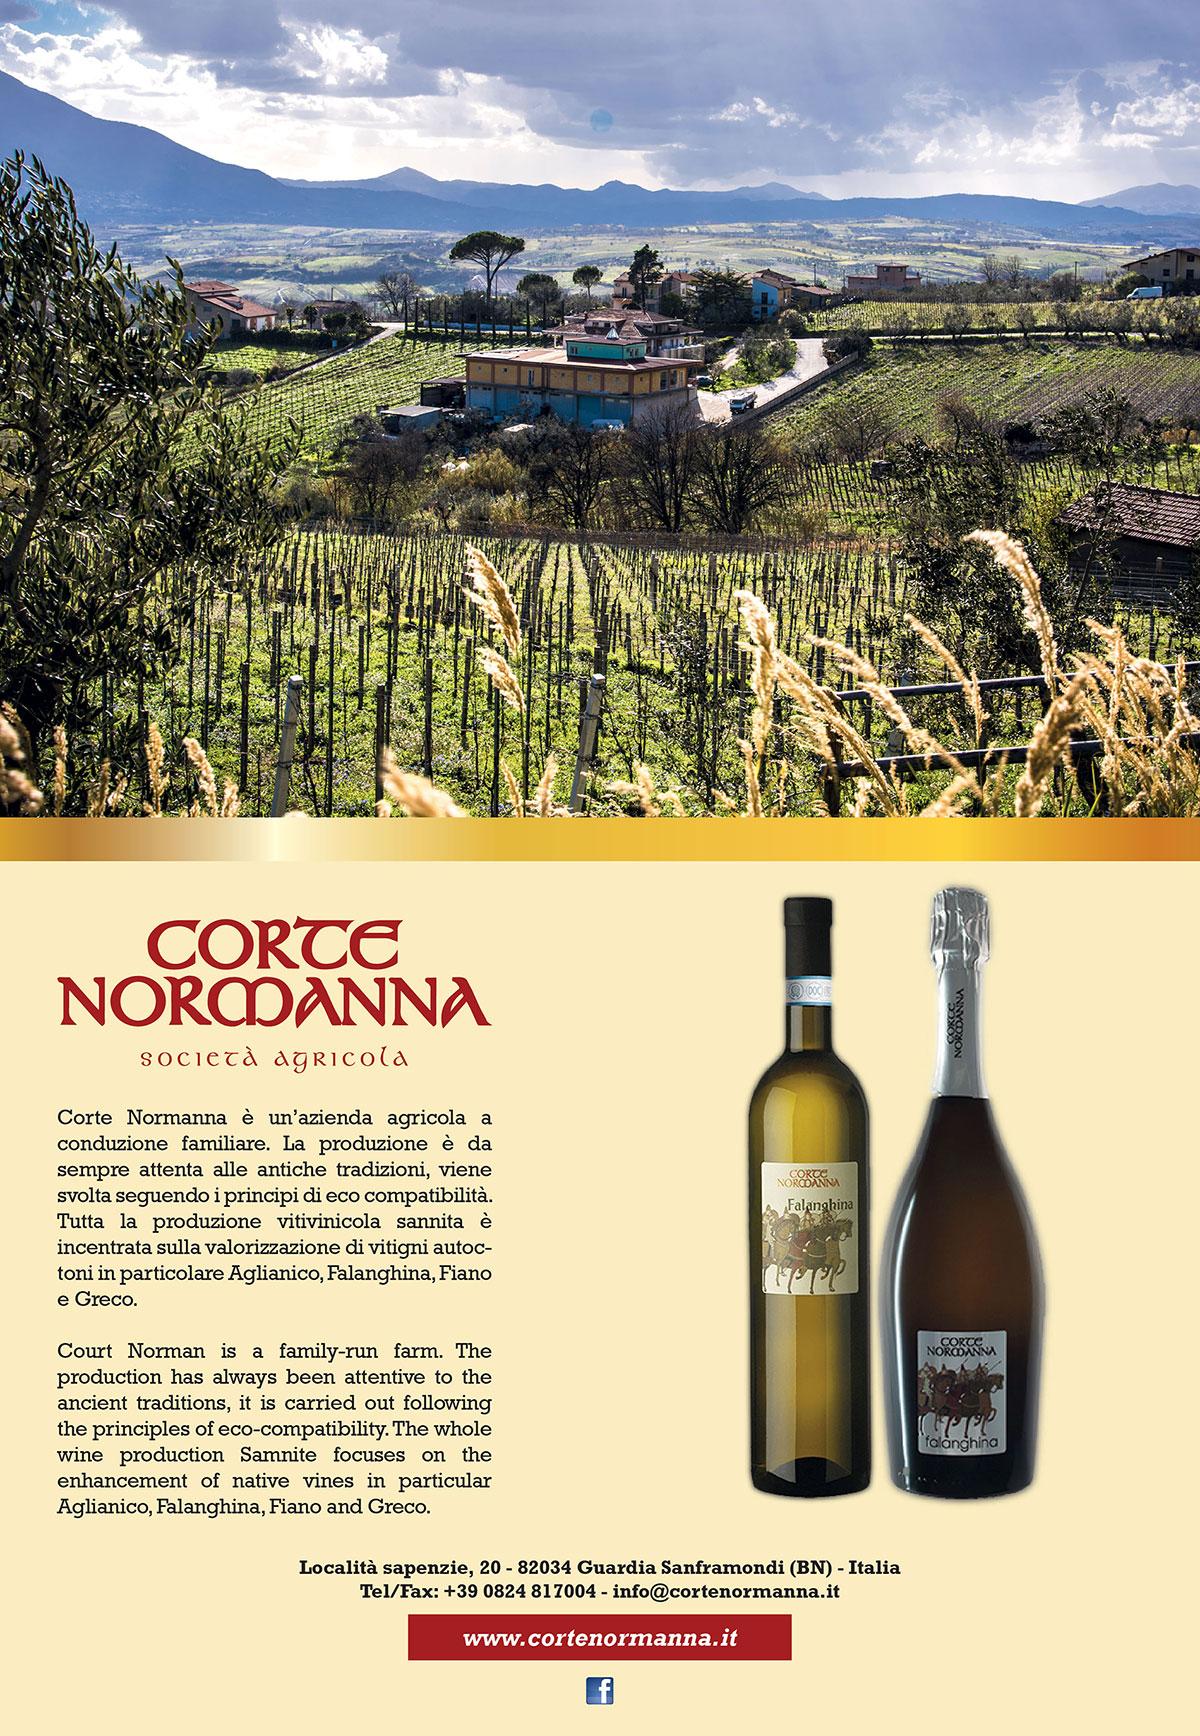 Corte-Normanna-Ads-04